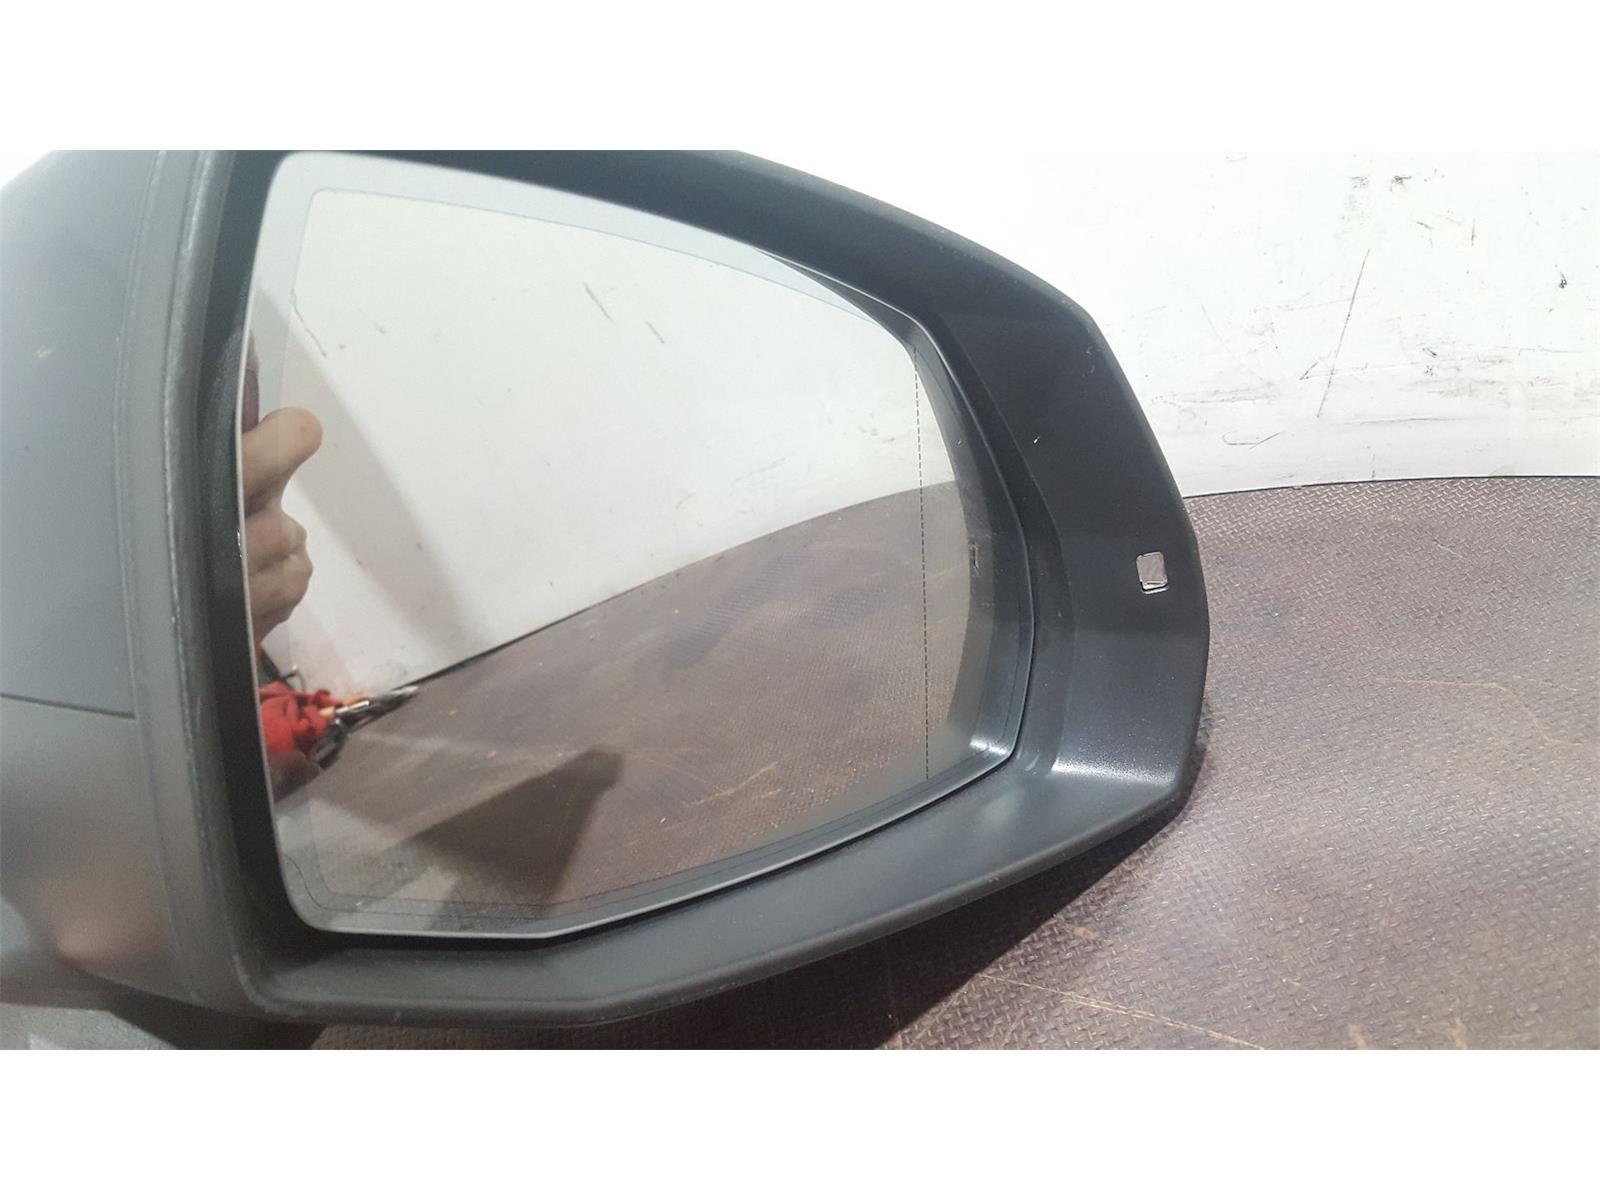 Audi Q7 2015 On SE Quattro TDi 4WD Door Mirror RH used and